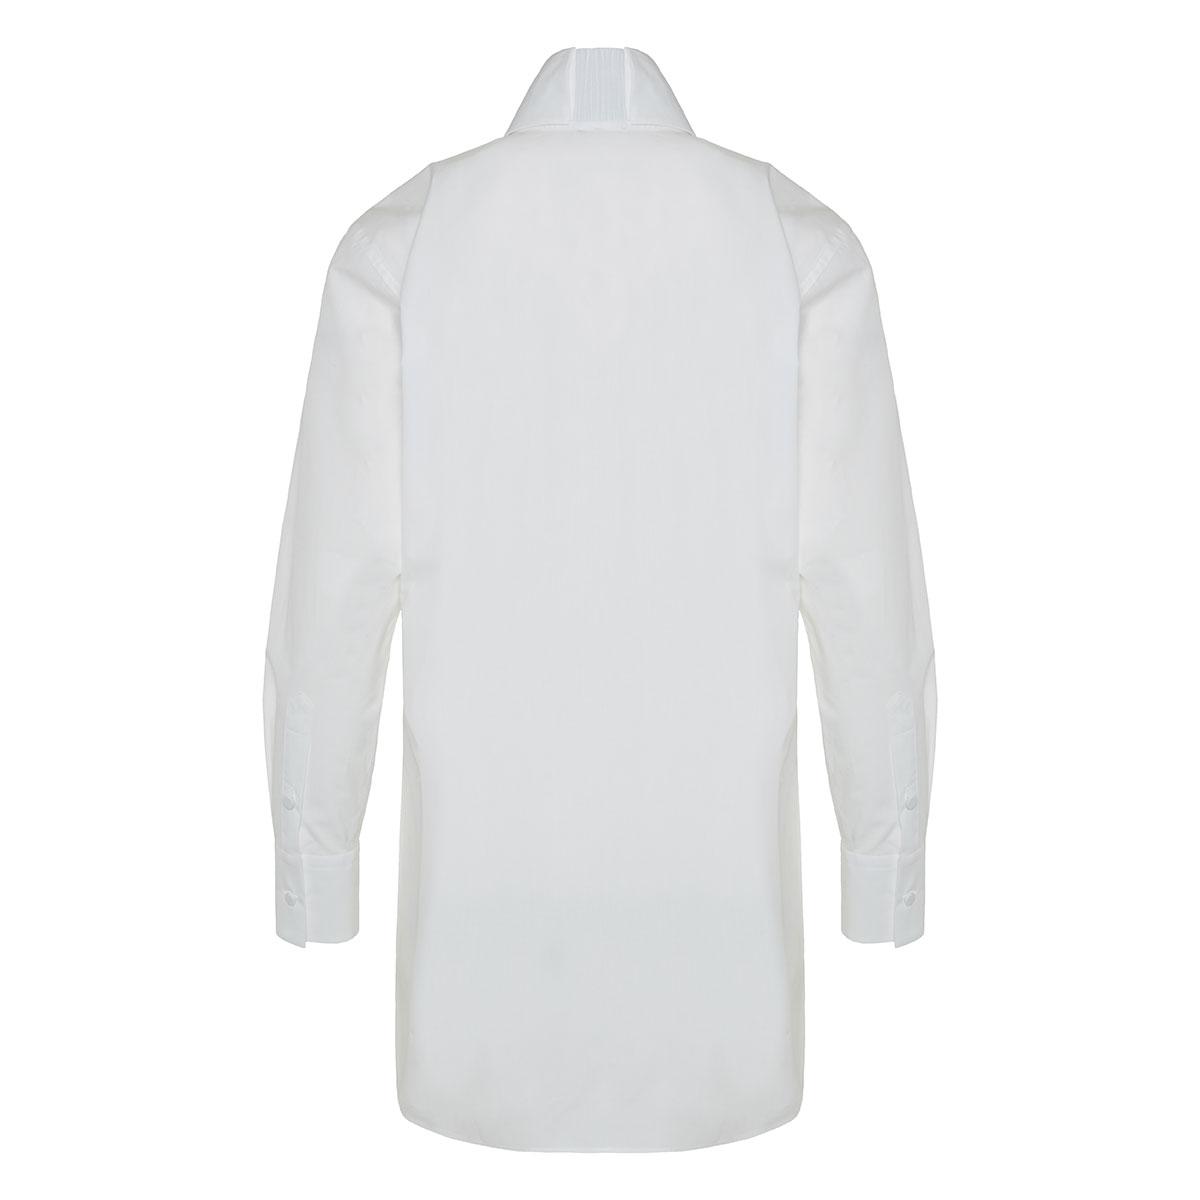 High-collar cotton shirt